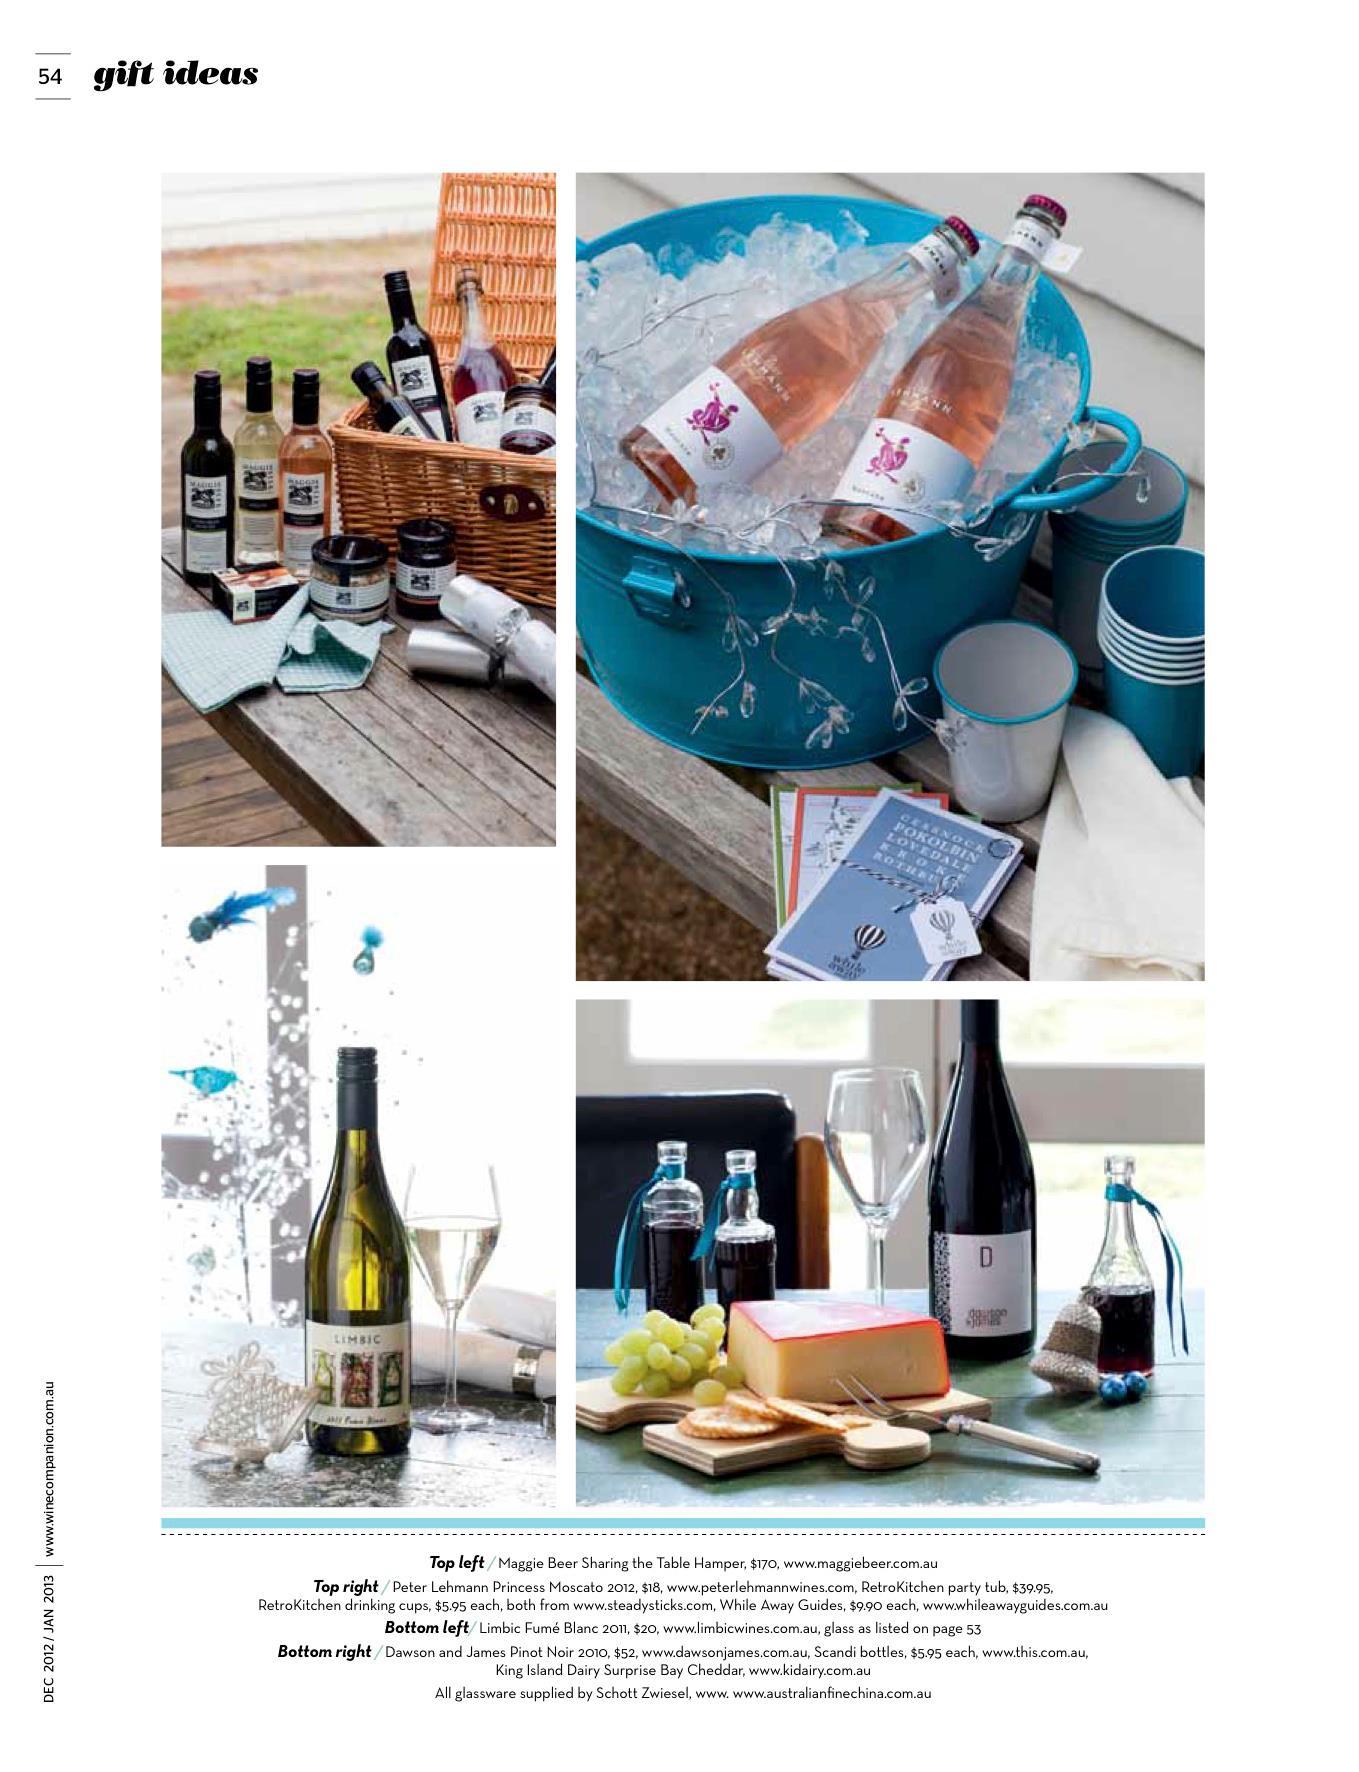 james halliday_wine companion_dec12.jpg